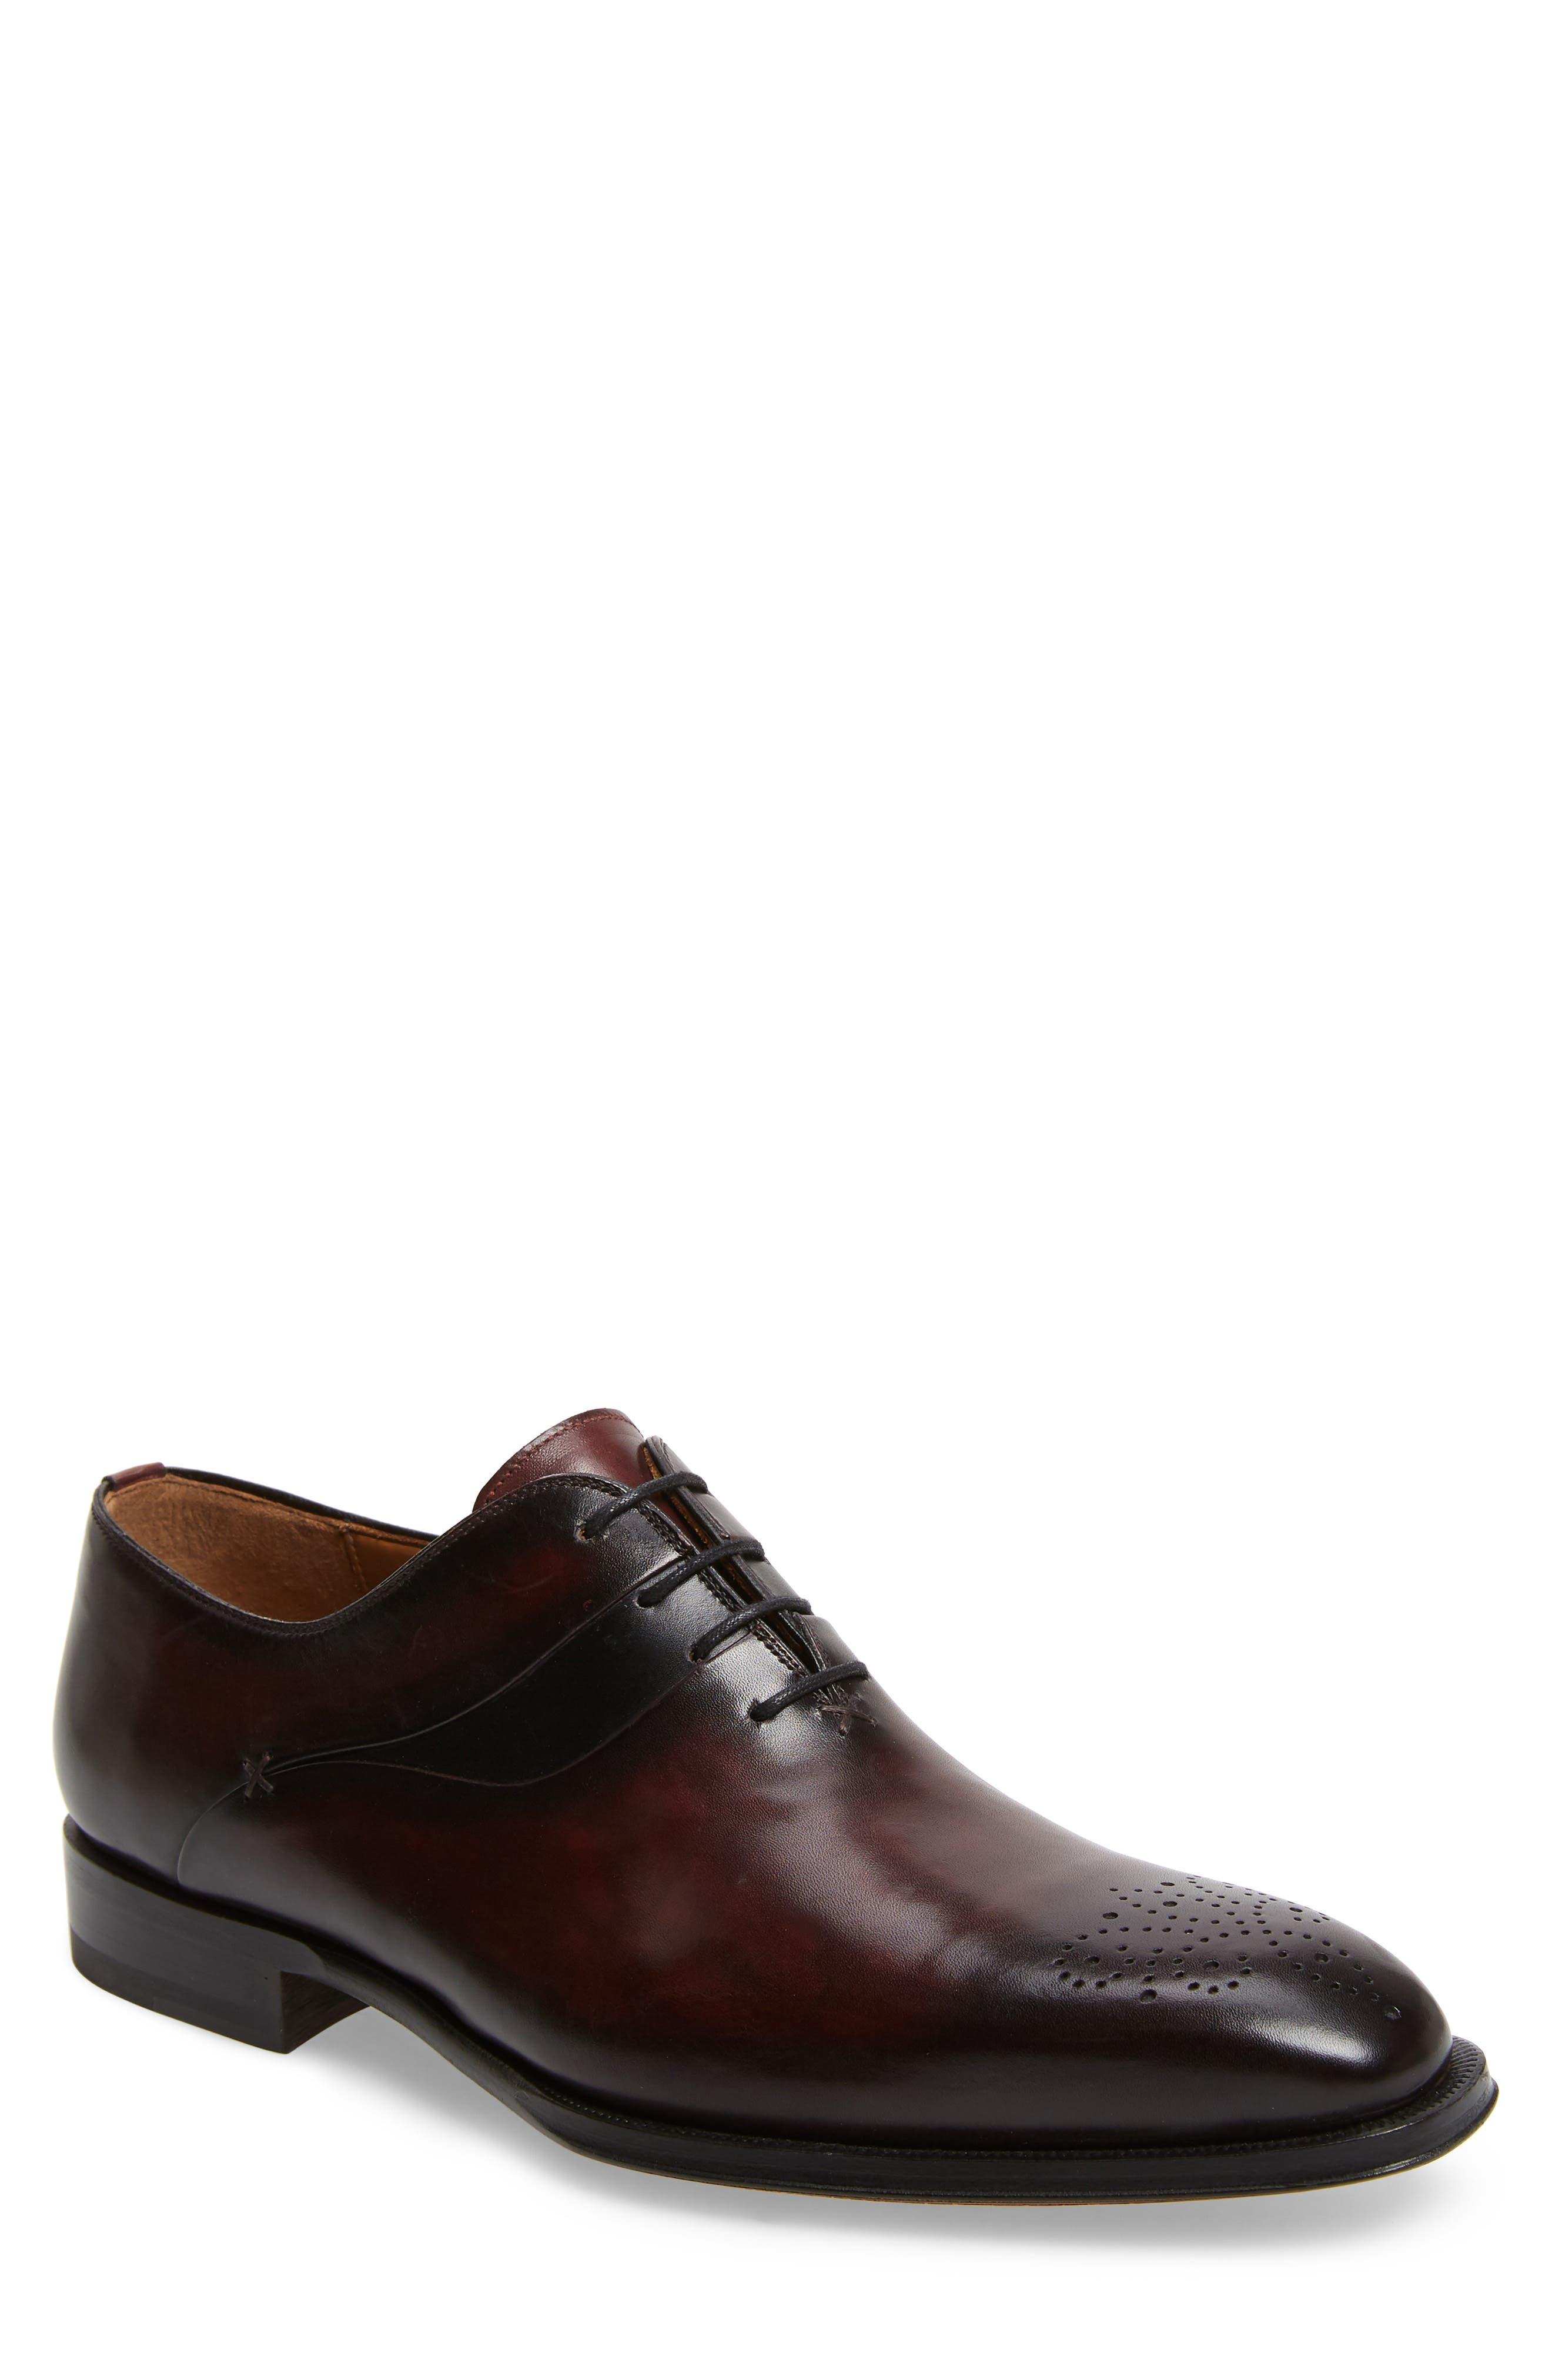 Hector Plain Toe Oxford,                         Main,                         color, BURGUNDY LEATHER